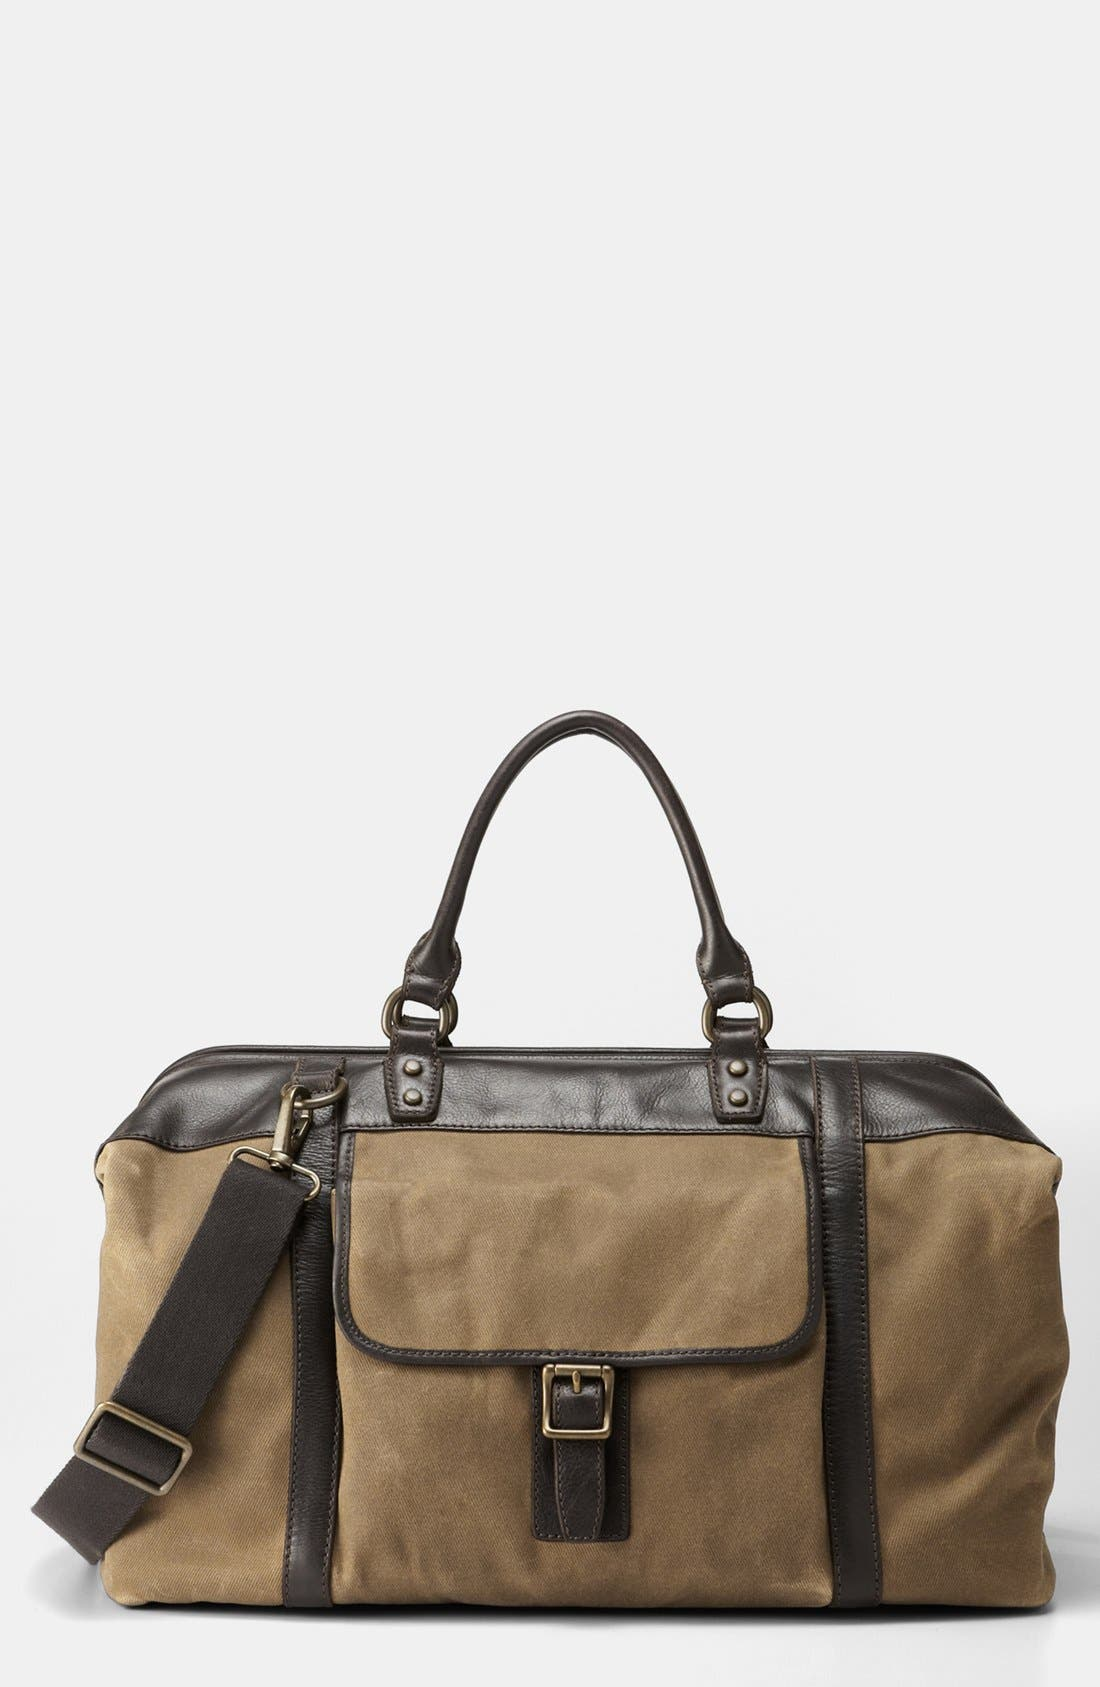 Main Image - Fossil 'Estate' Duffle Bag